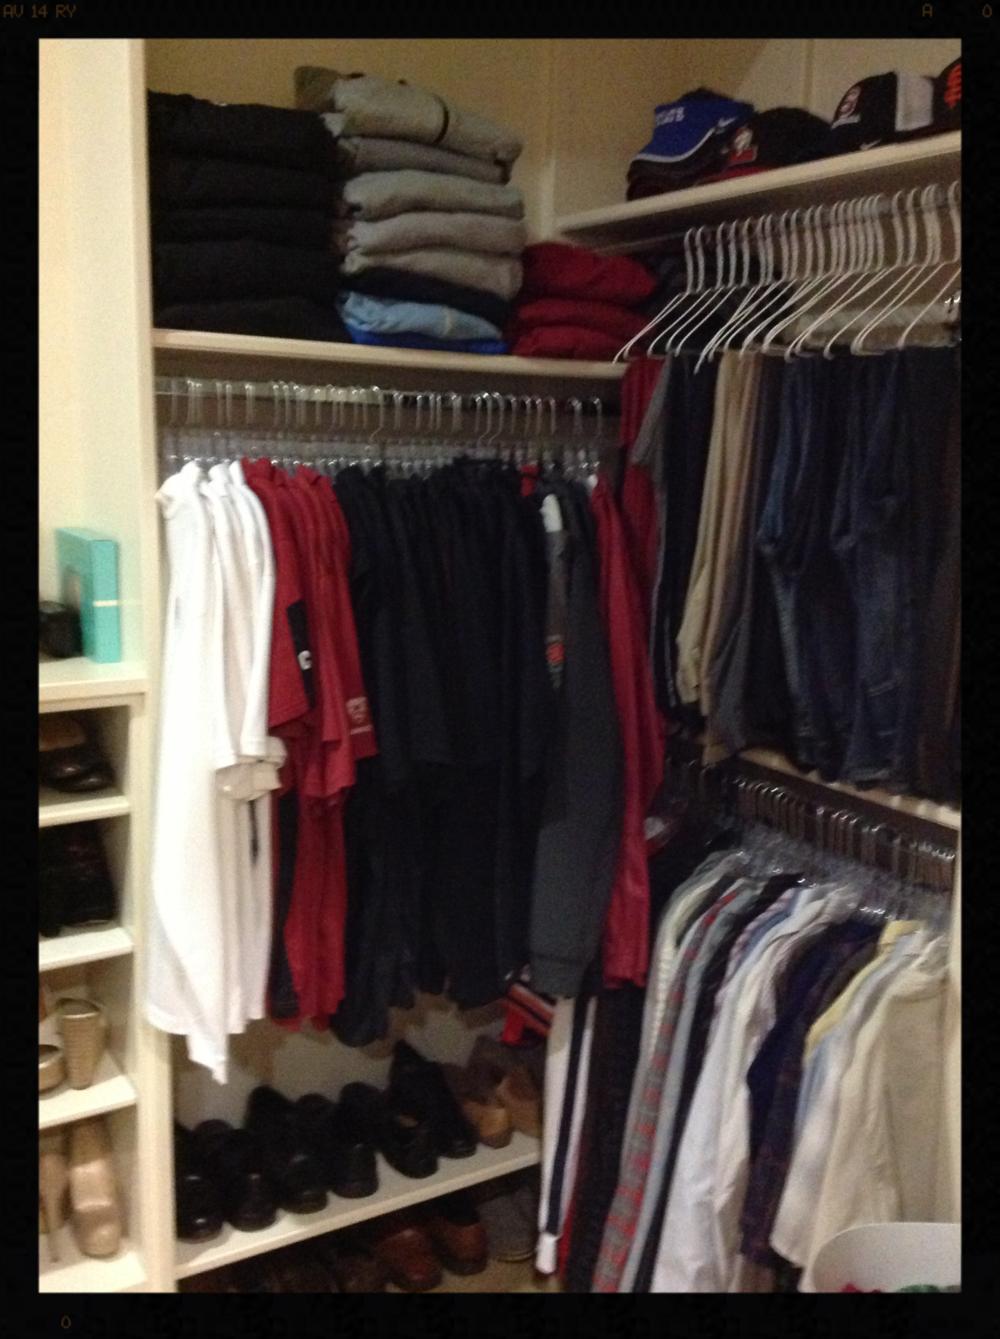 Men's closet after